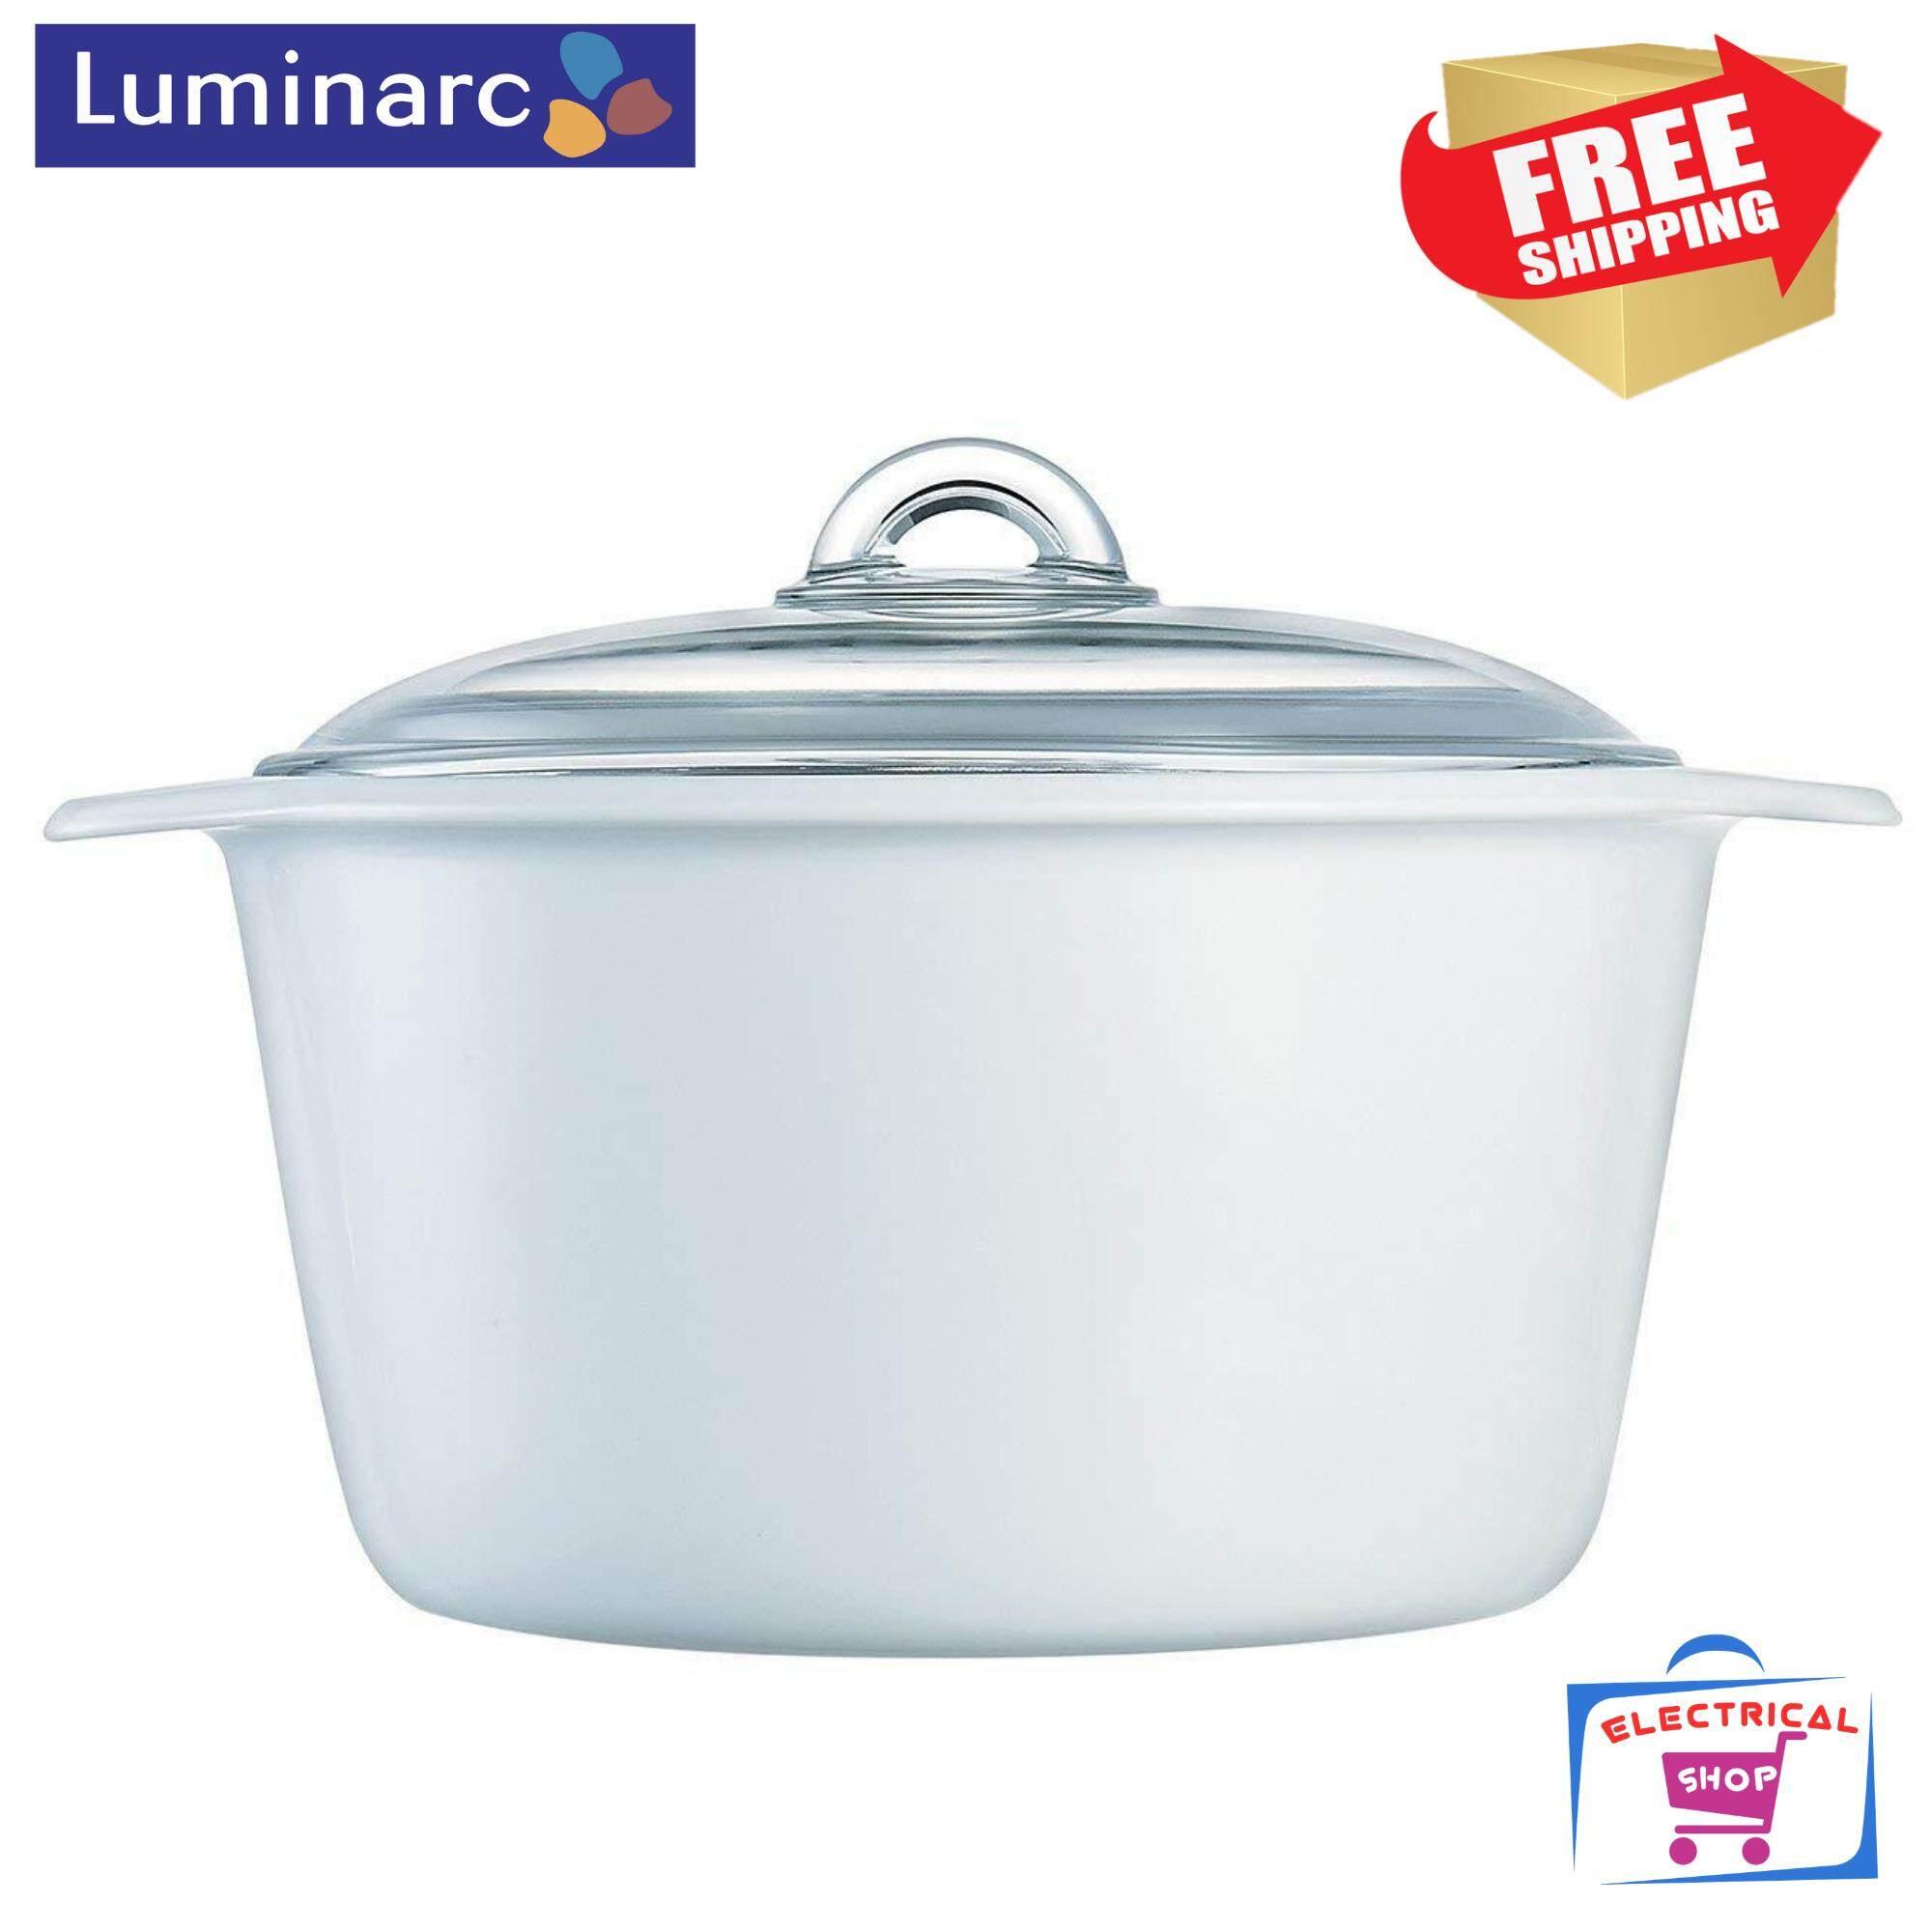 Home Cookware Buy At Best Price In Malaysia Www Maxim Presto Pressure Cooker 24 Cm 7 L Silver Luminarc Vitroflam White 3l 20cm Plain Vitroline Made France Like